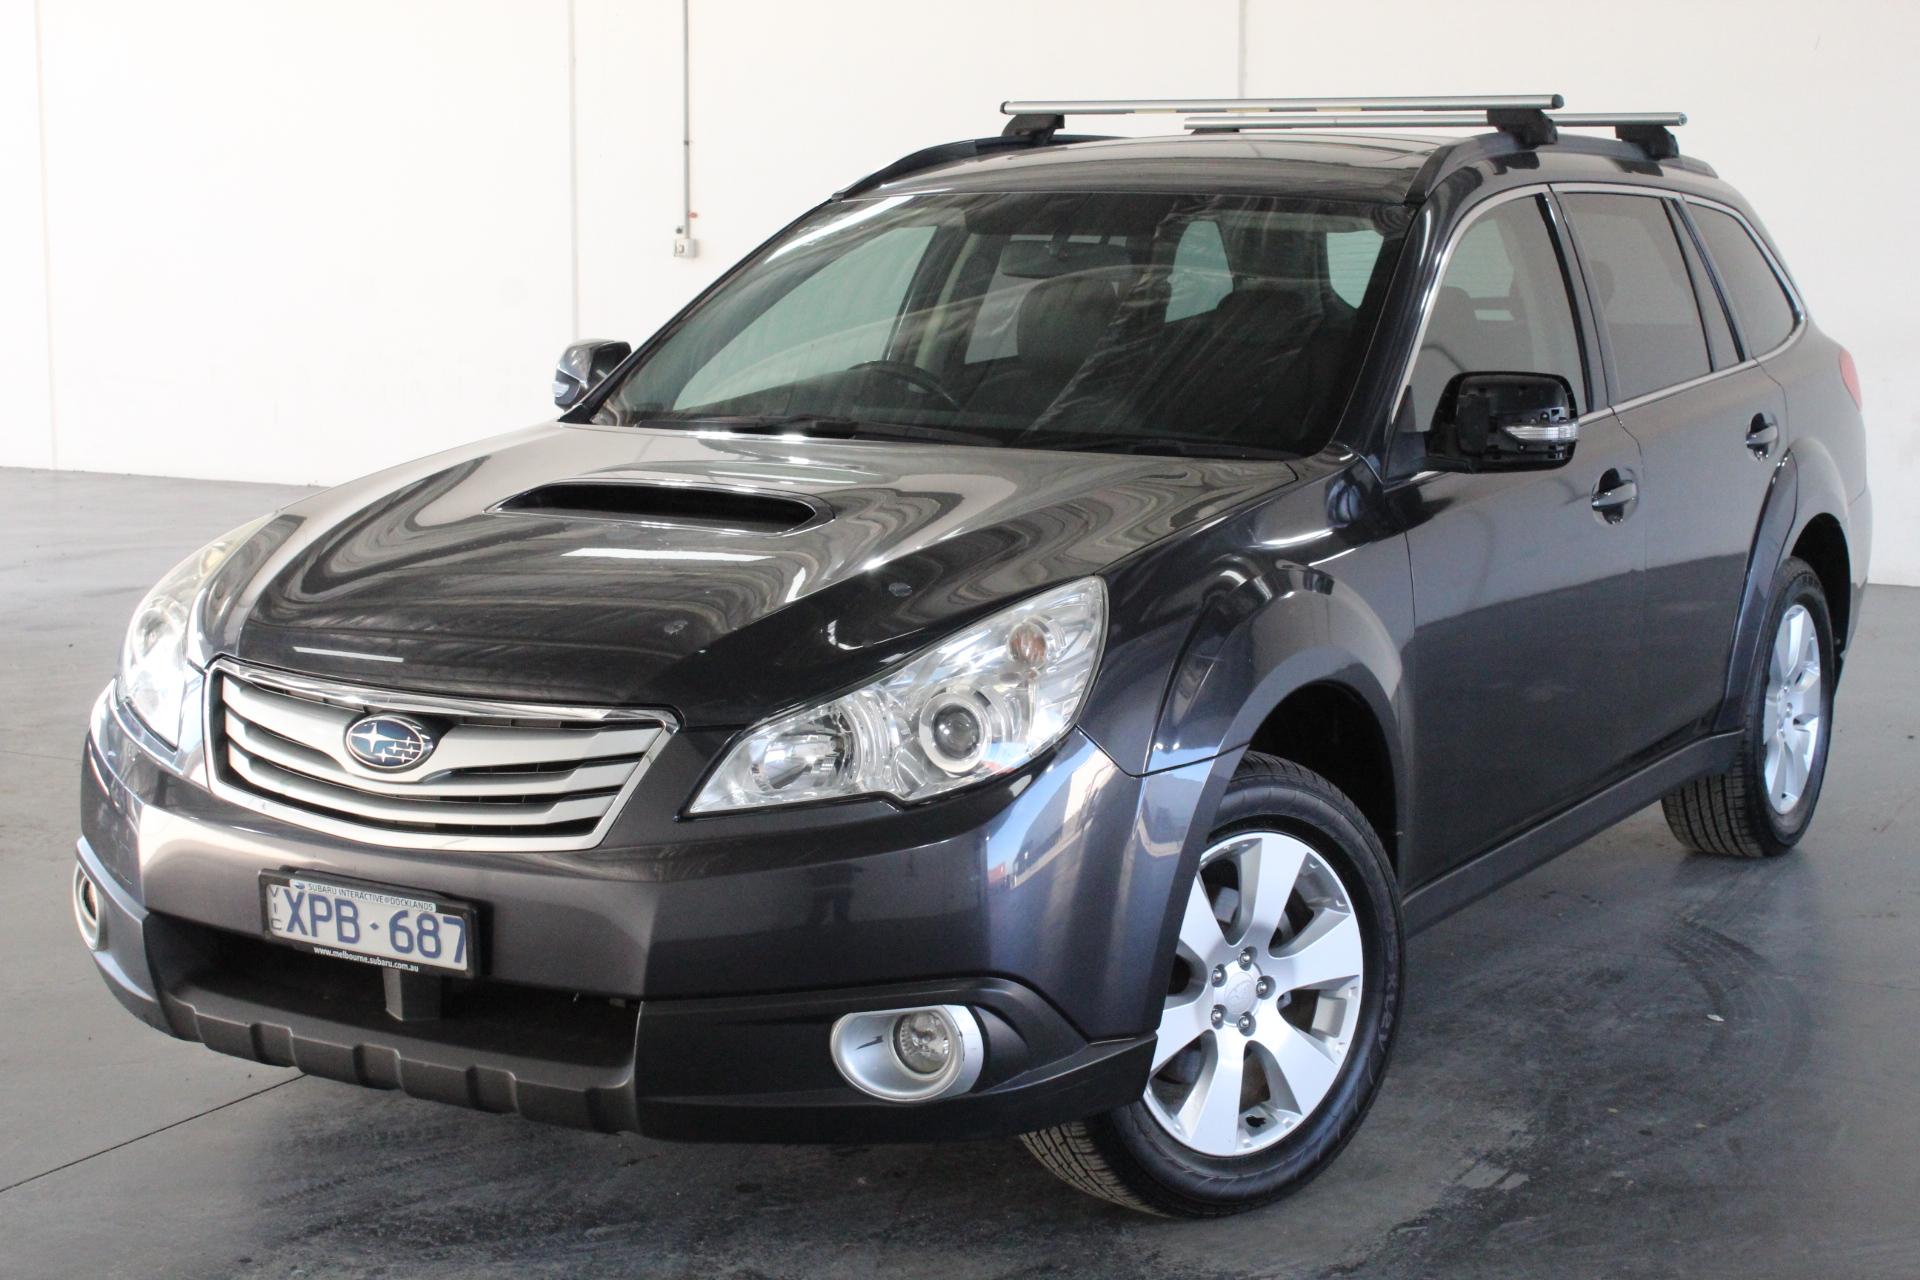 2010 Subaru Outback Turbo Diesel Manual Wagon